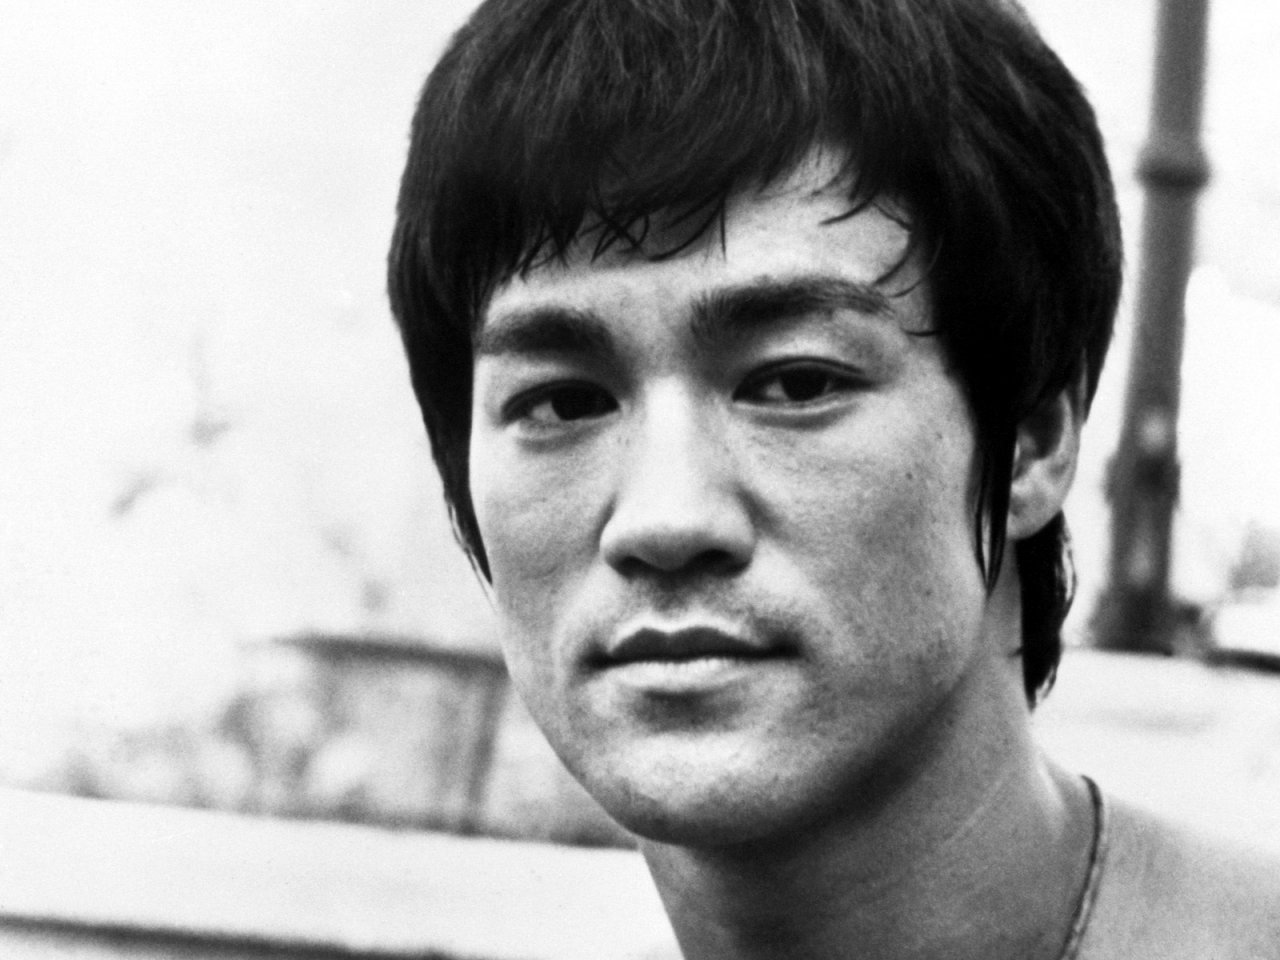 Bruce Lee Wallpaper 21